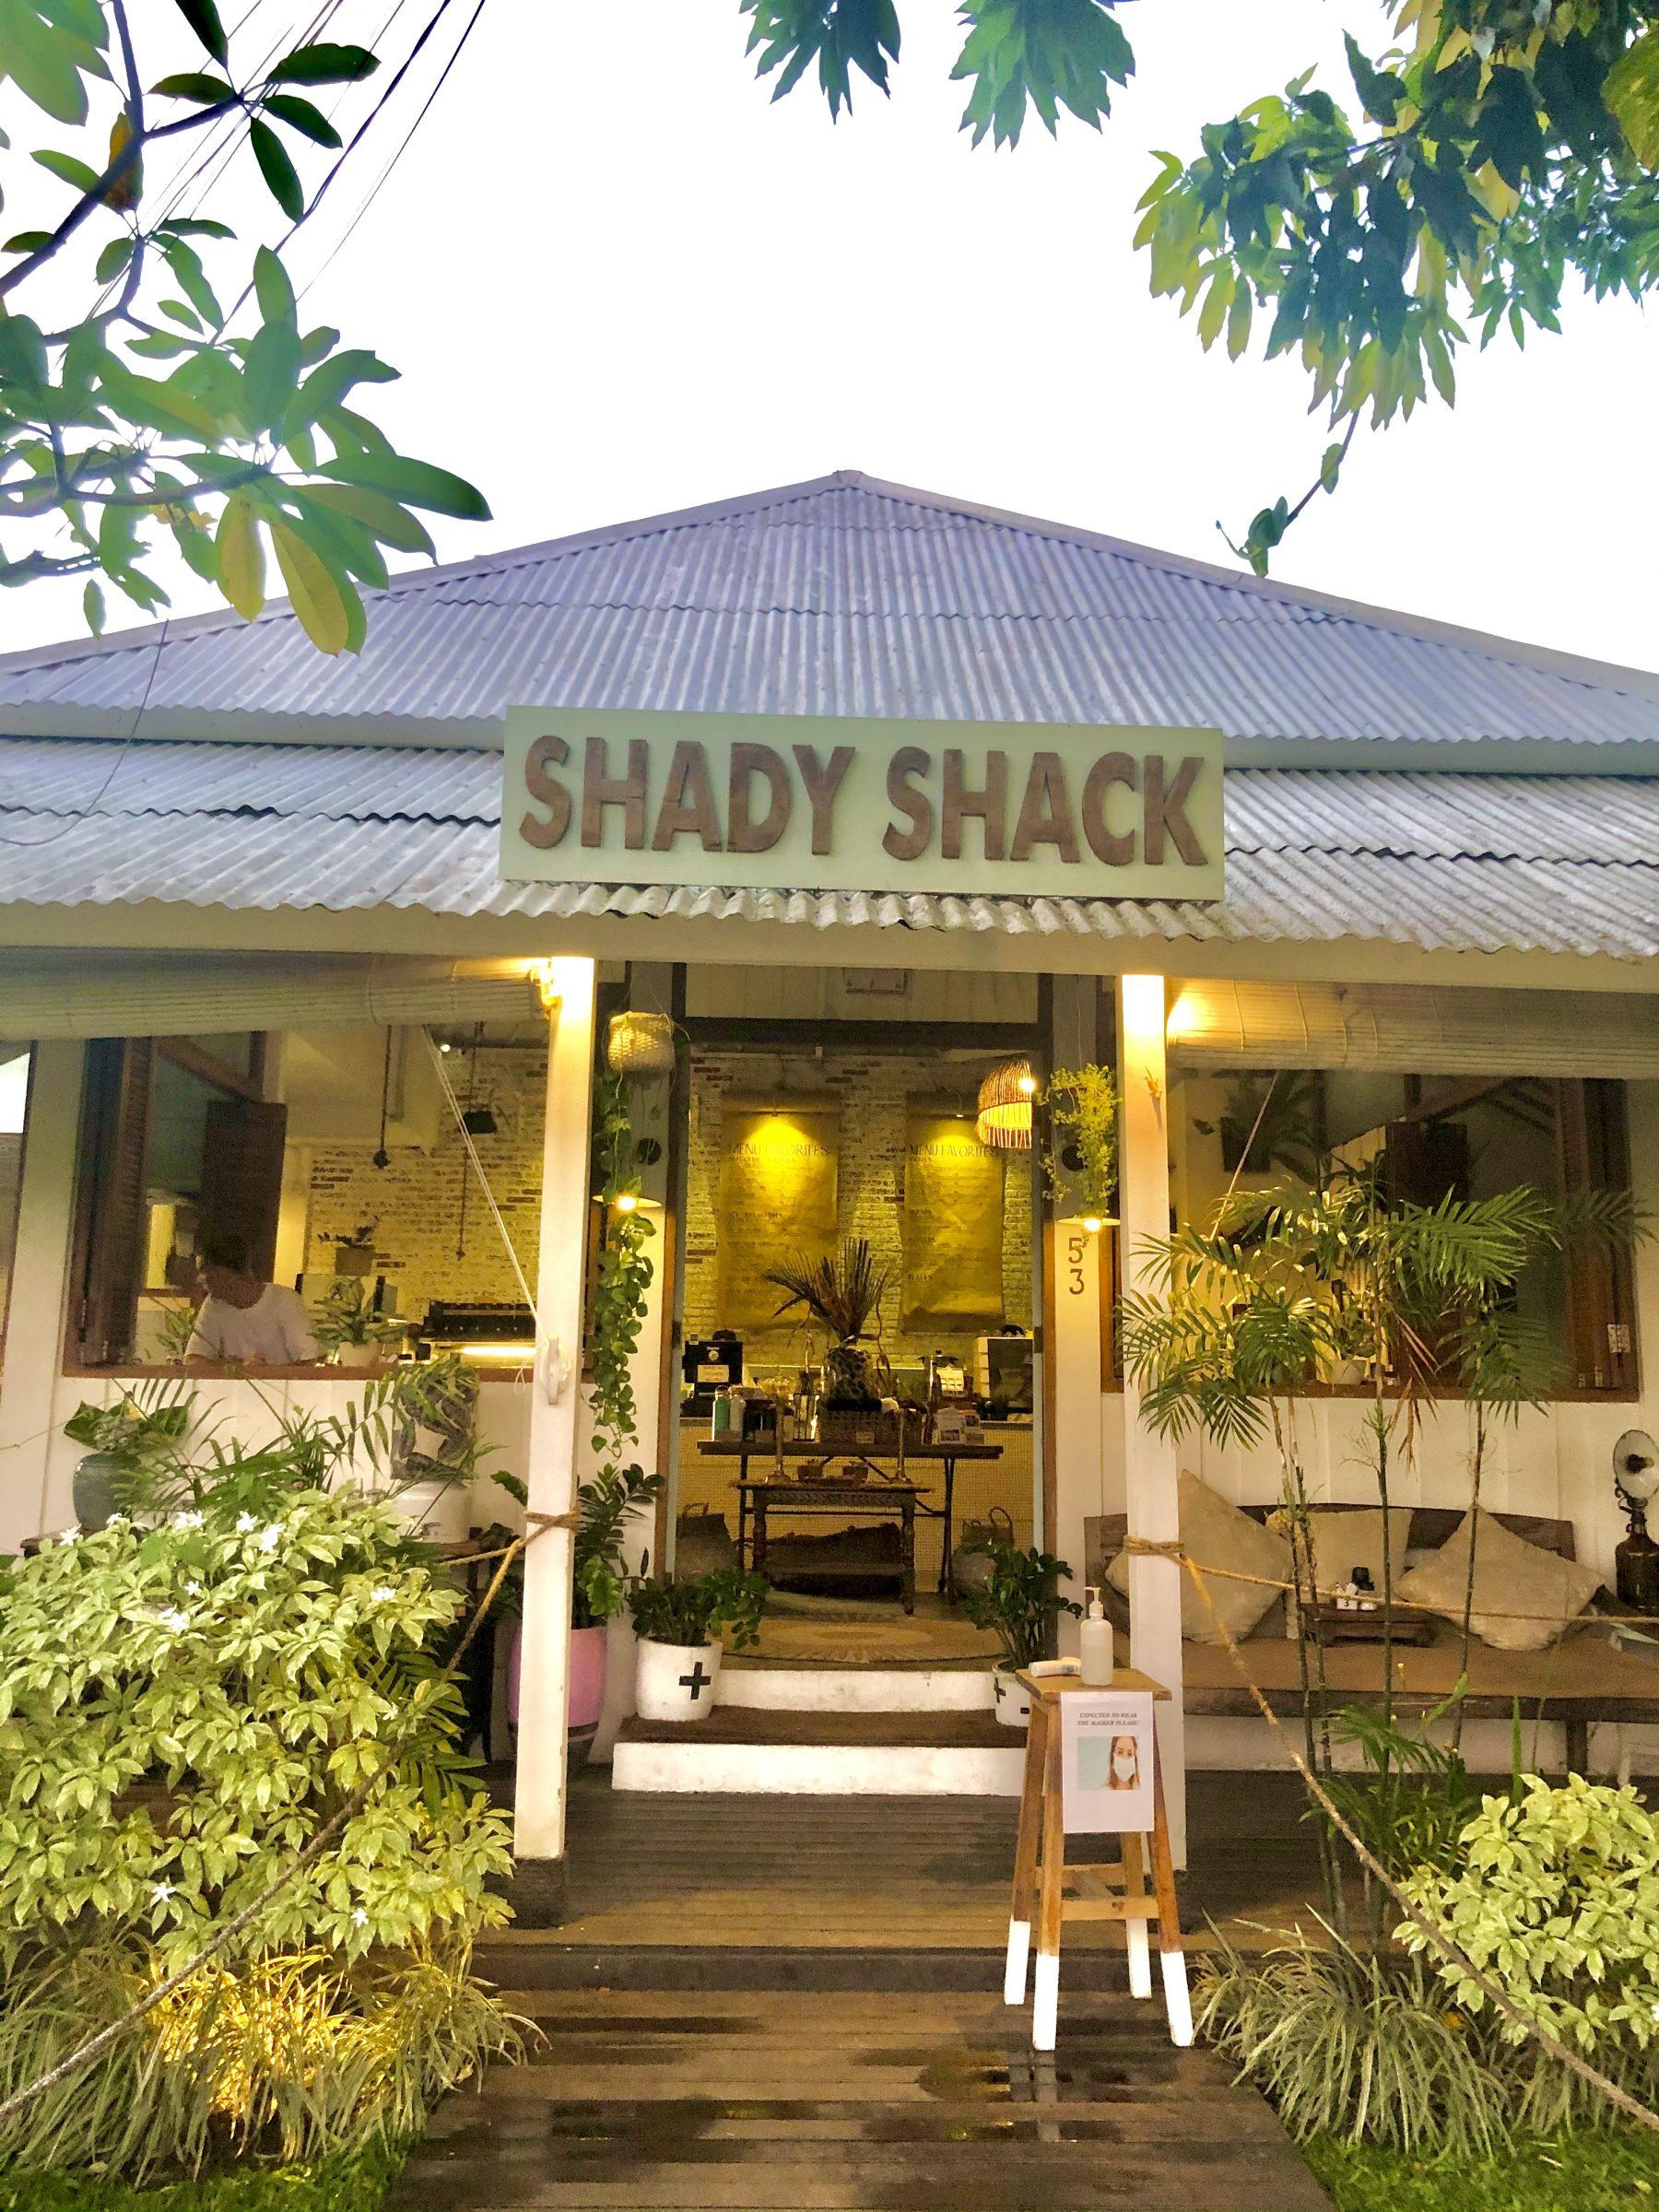 Restaurant Shady Shack, Bali